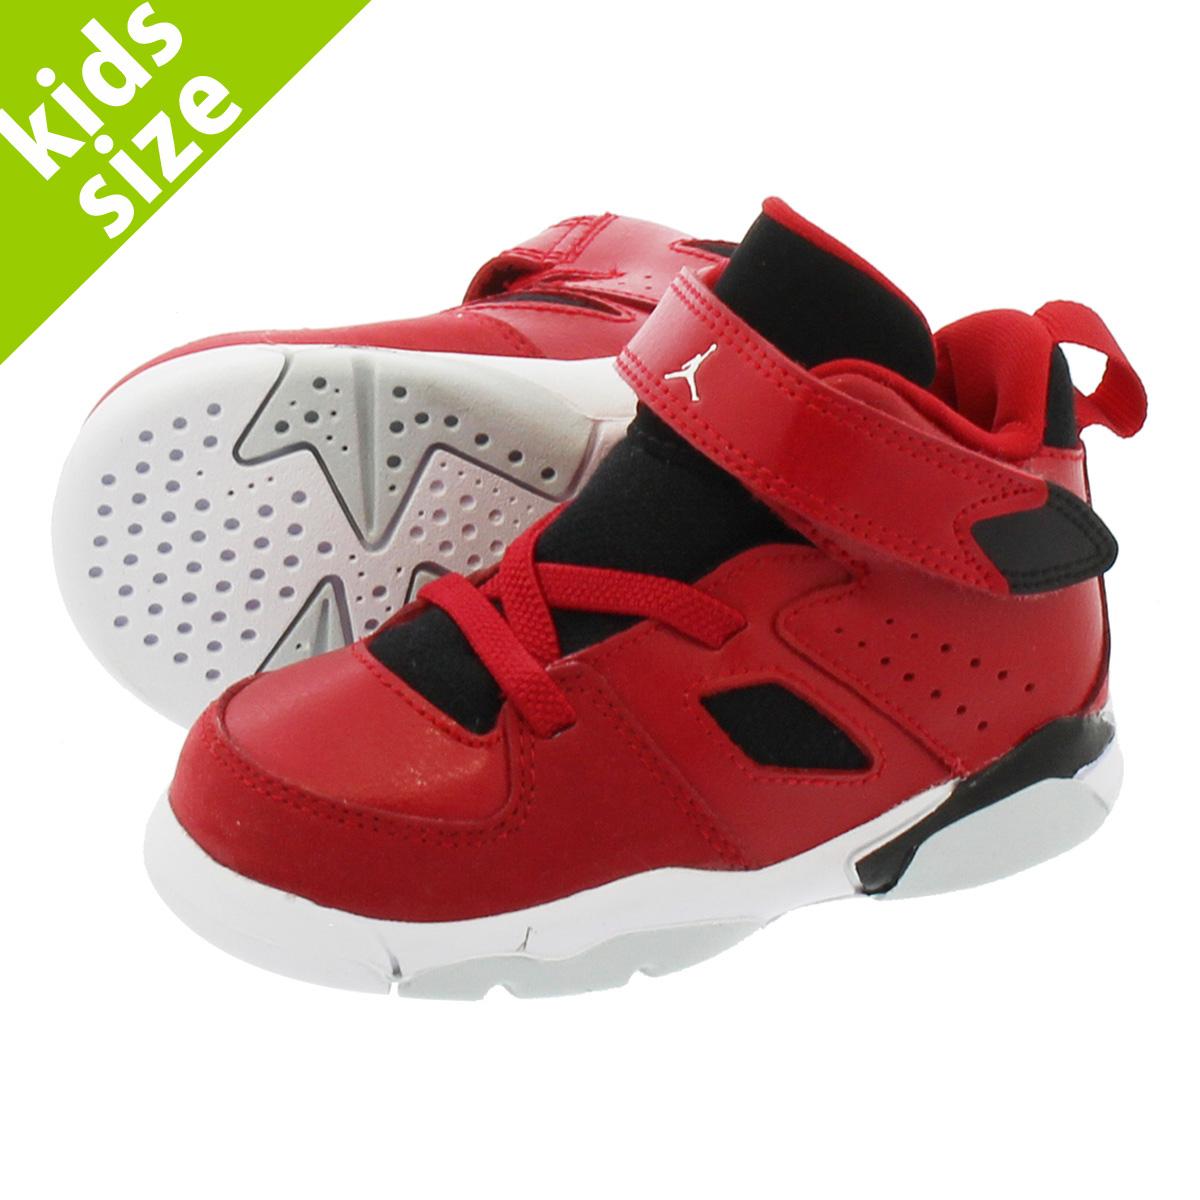 NIKE JORDAN FLIGHT CLUB 91 TD Nike Jordan flight club 91 TD RED BLACK WHITE 3abc7c3ae351